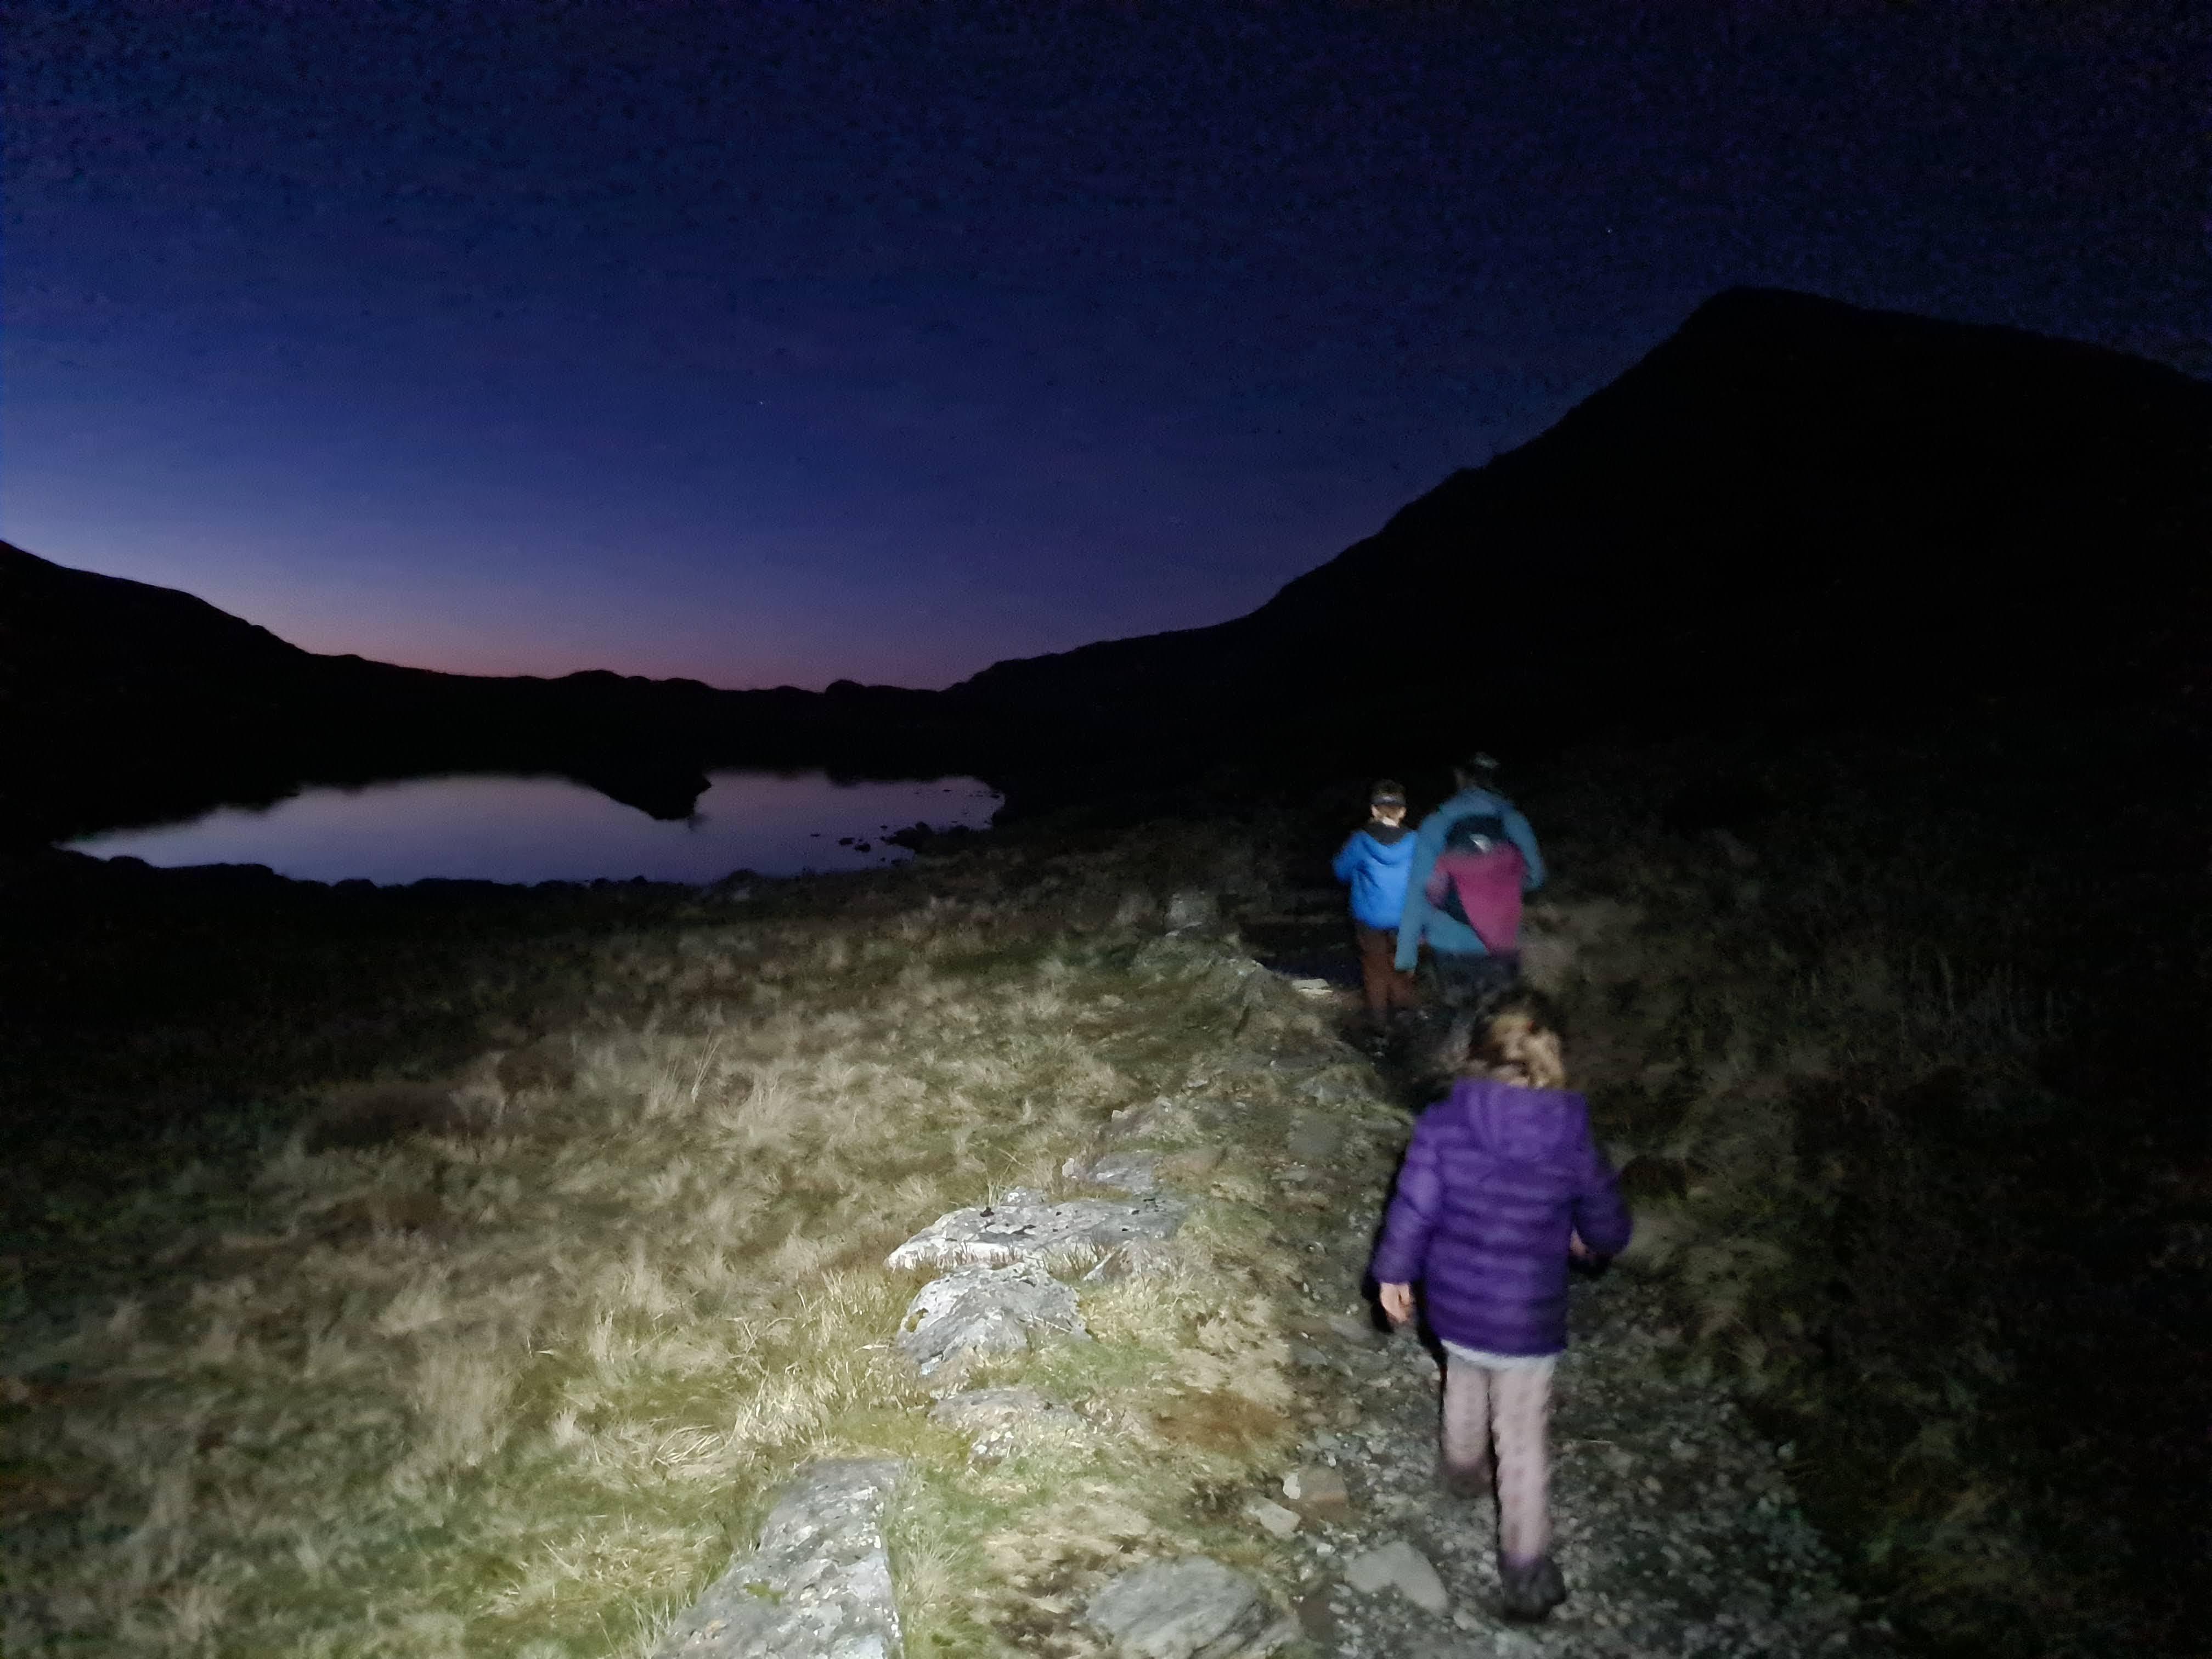 Night Navigation Skills Course